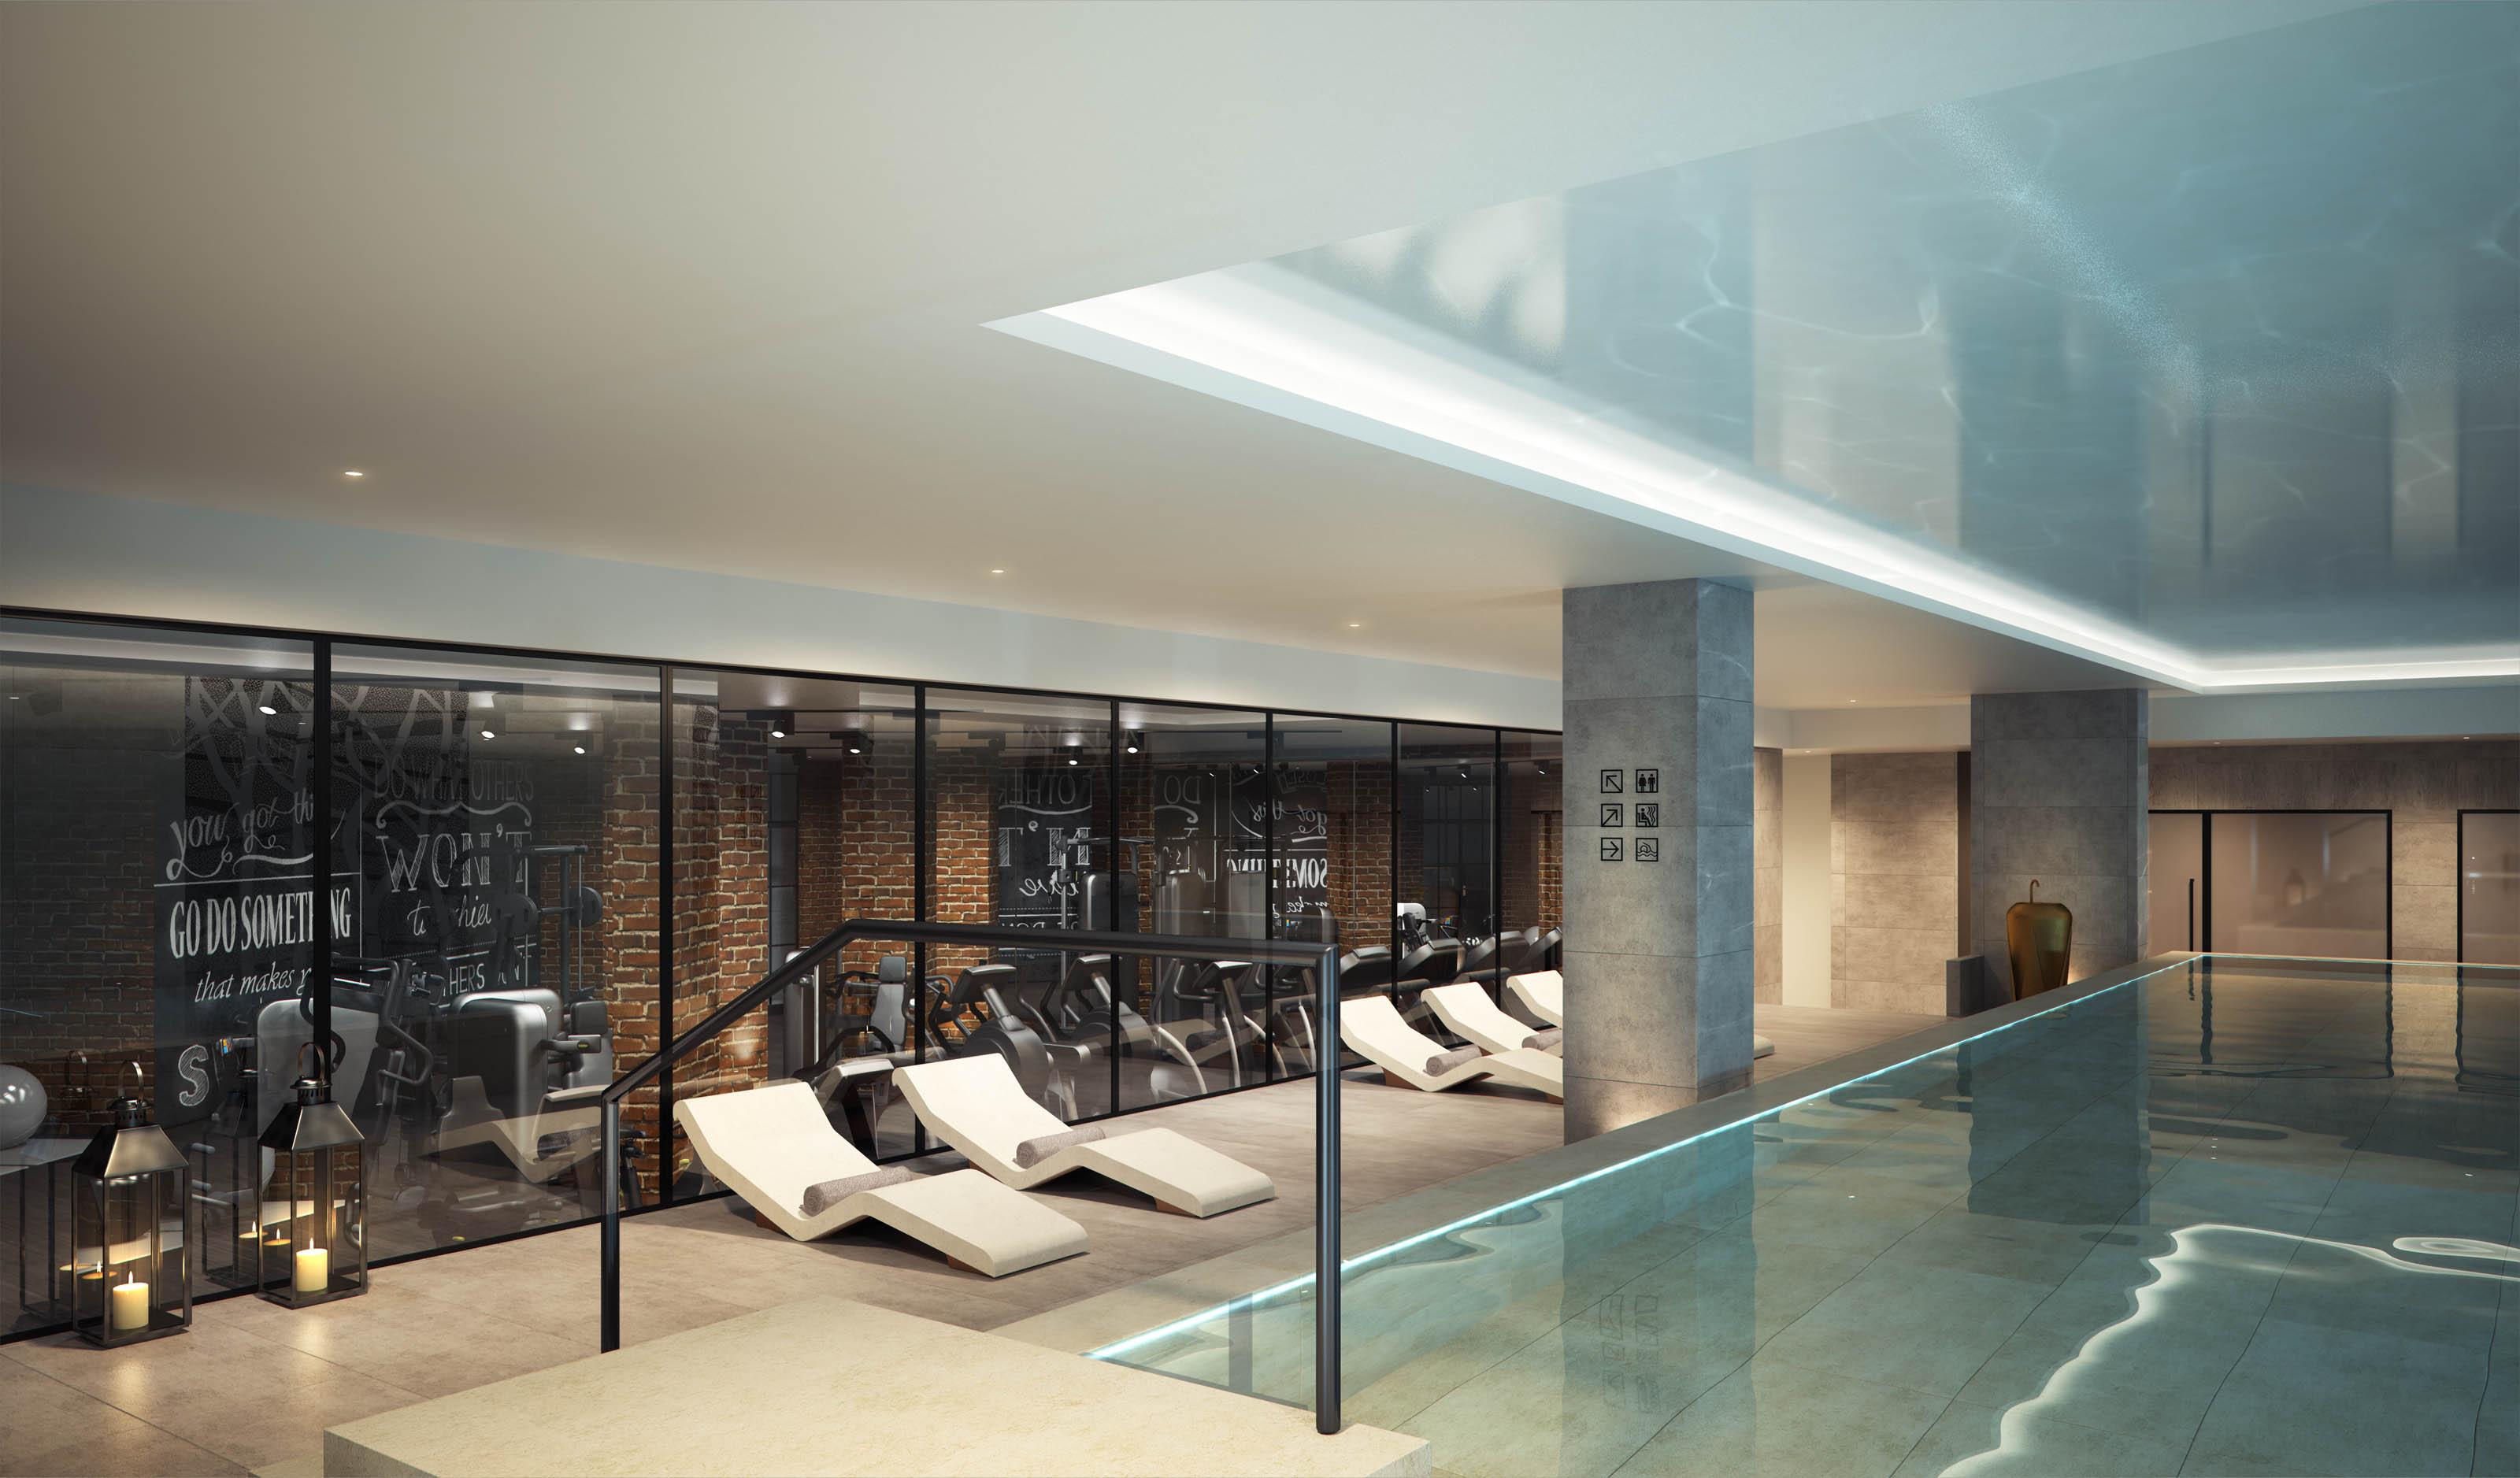 Fabrica,Pool & Sport